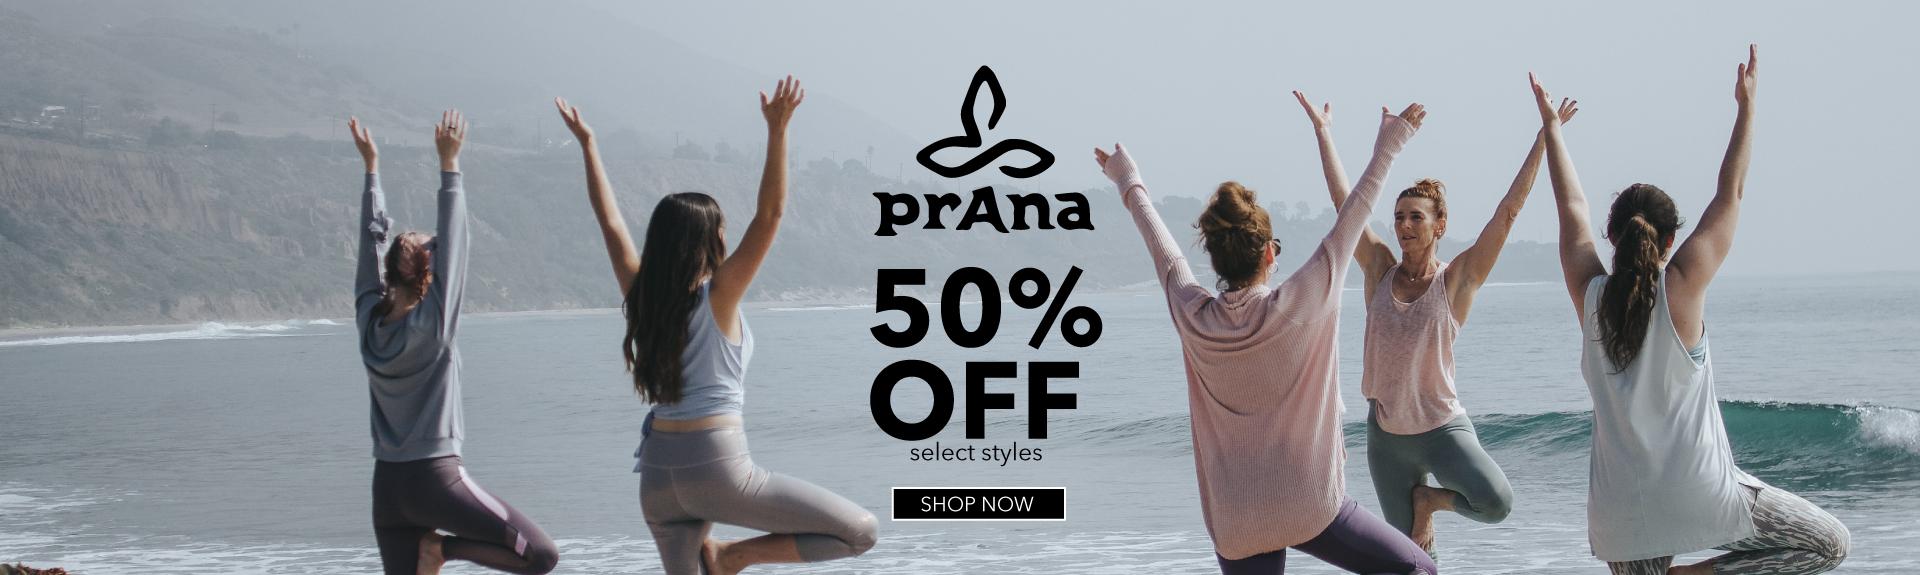 prAna - 50% OFF